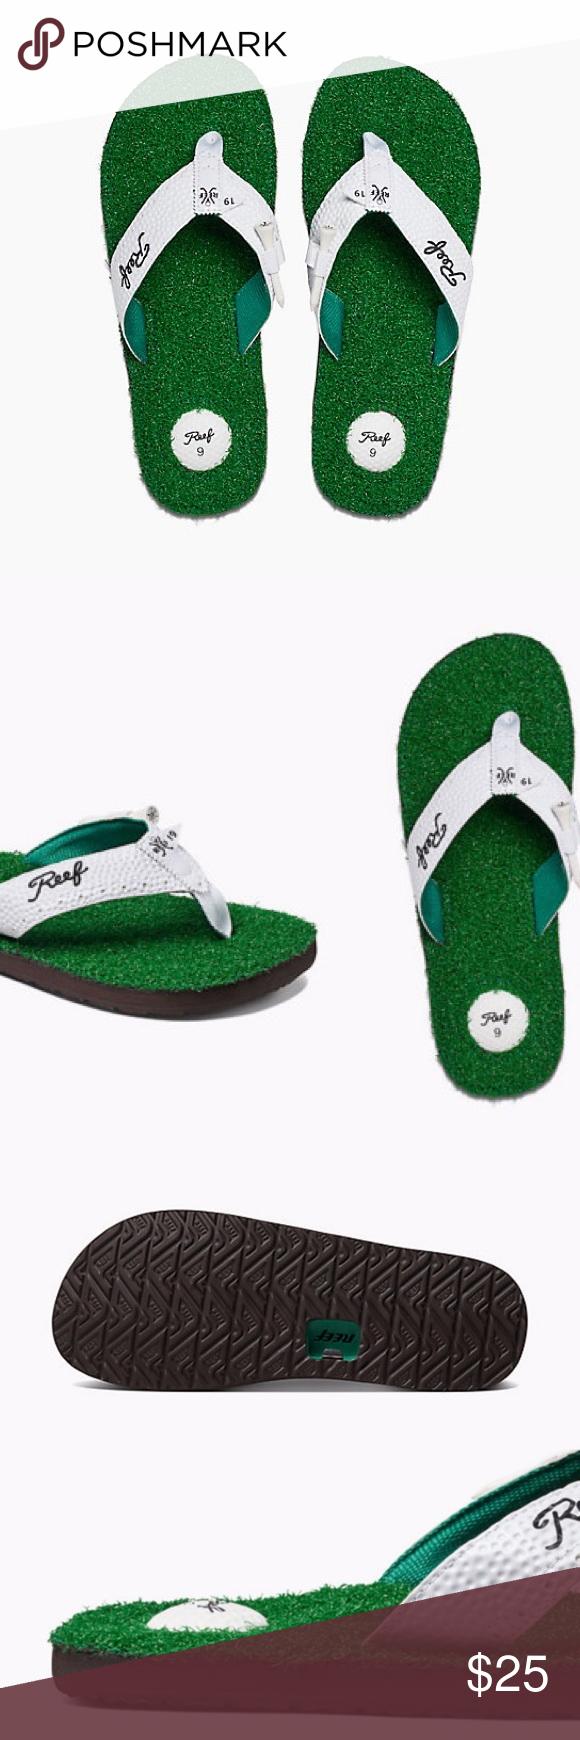 b3f3d82f0bd62 NWT Reef Mulligan 2 ii men s golf flip flops Brand new with tag-in original